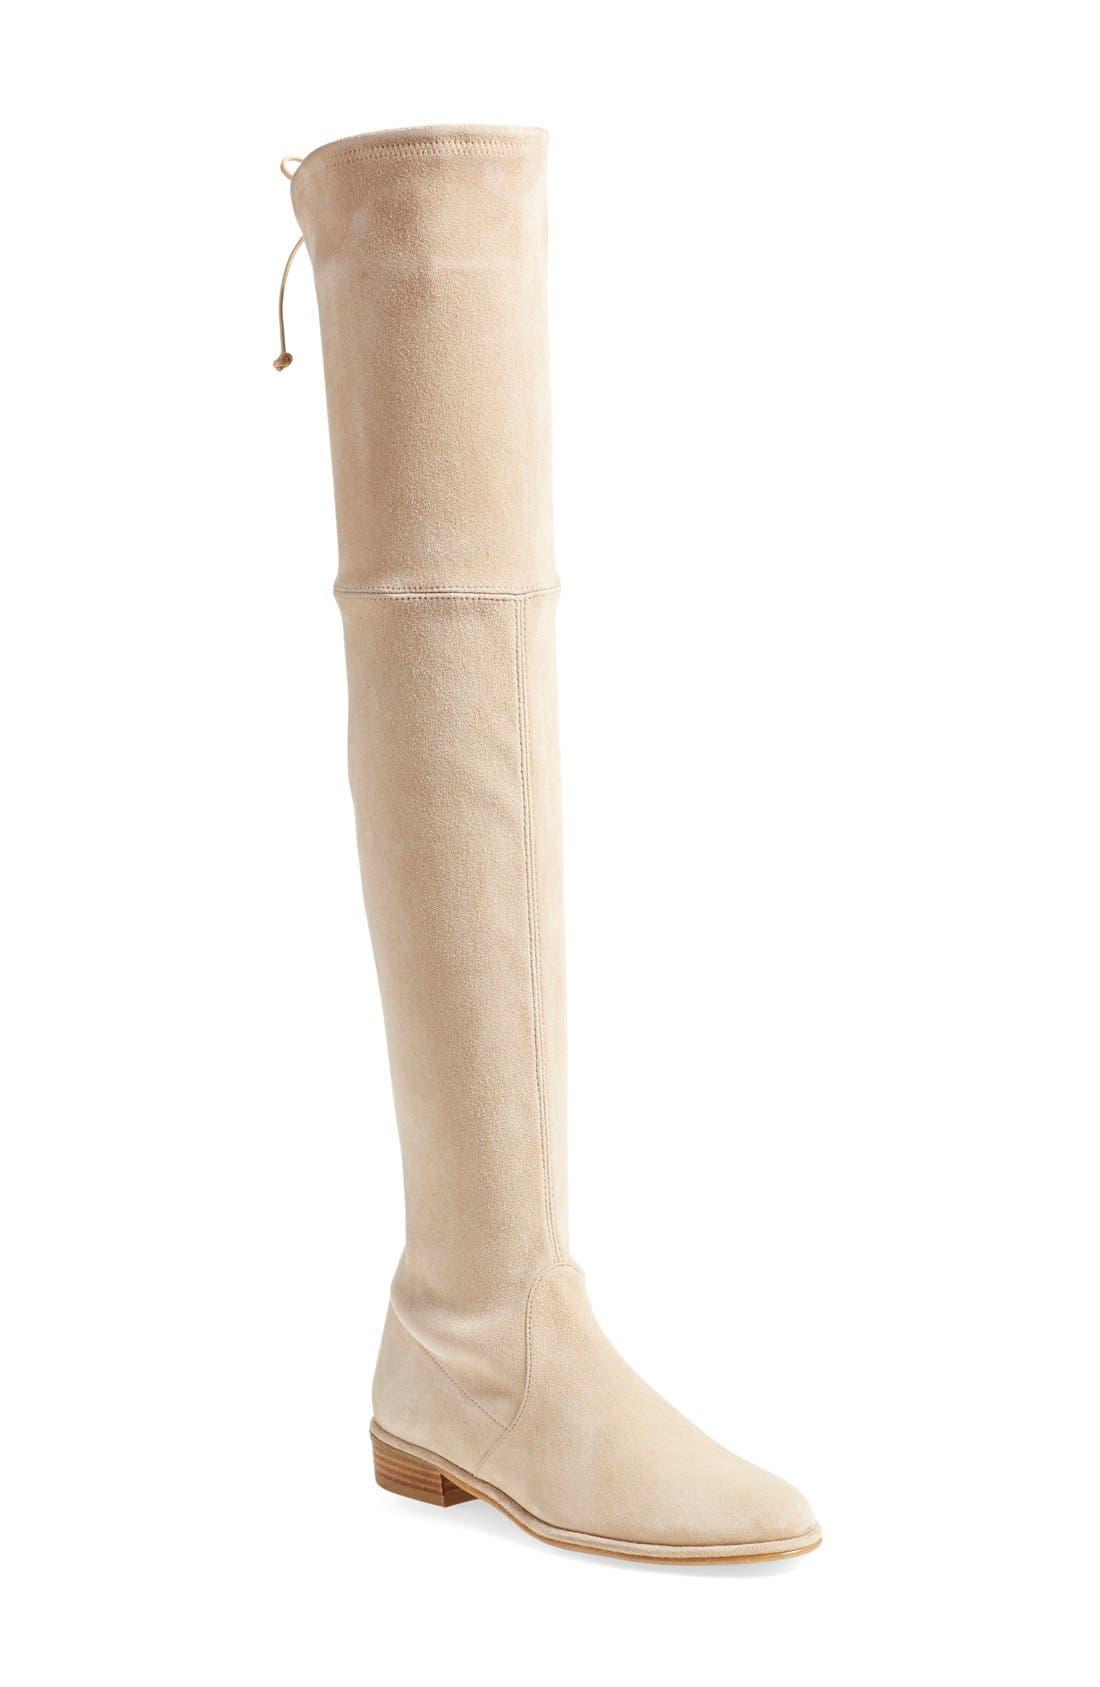 Main Image - Stuart Weitzman 'Lowland' Over the Knee Boot (Women)